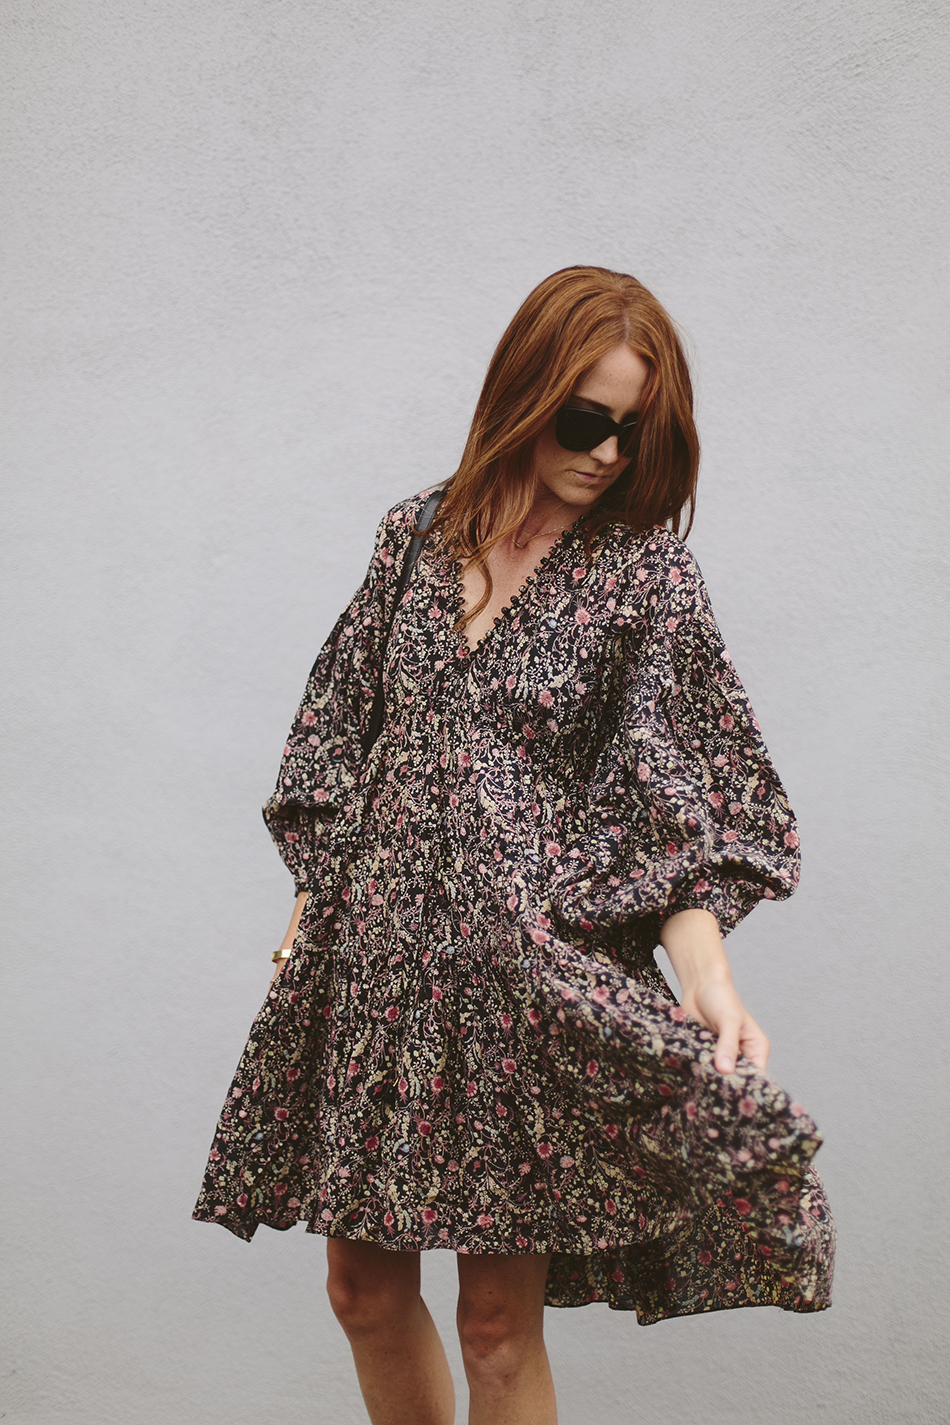 doen-grasse-dress-2